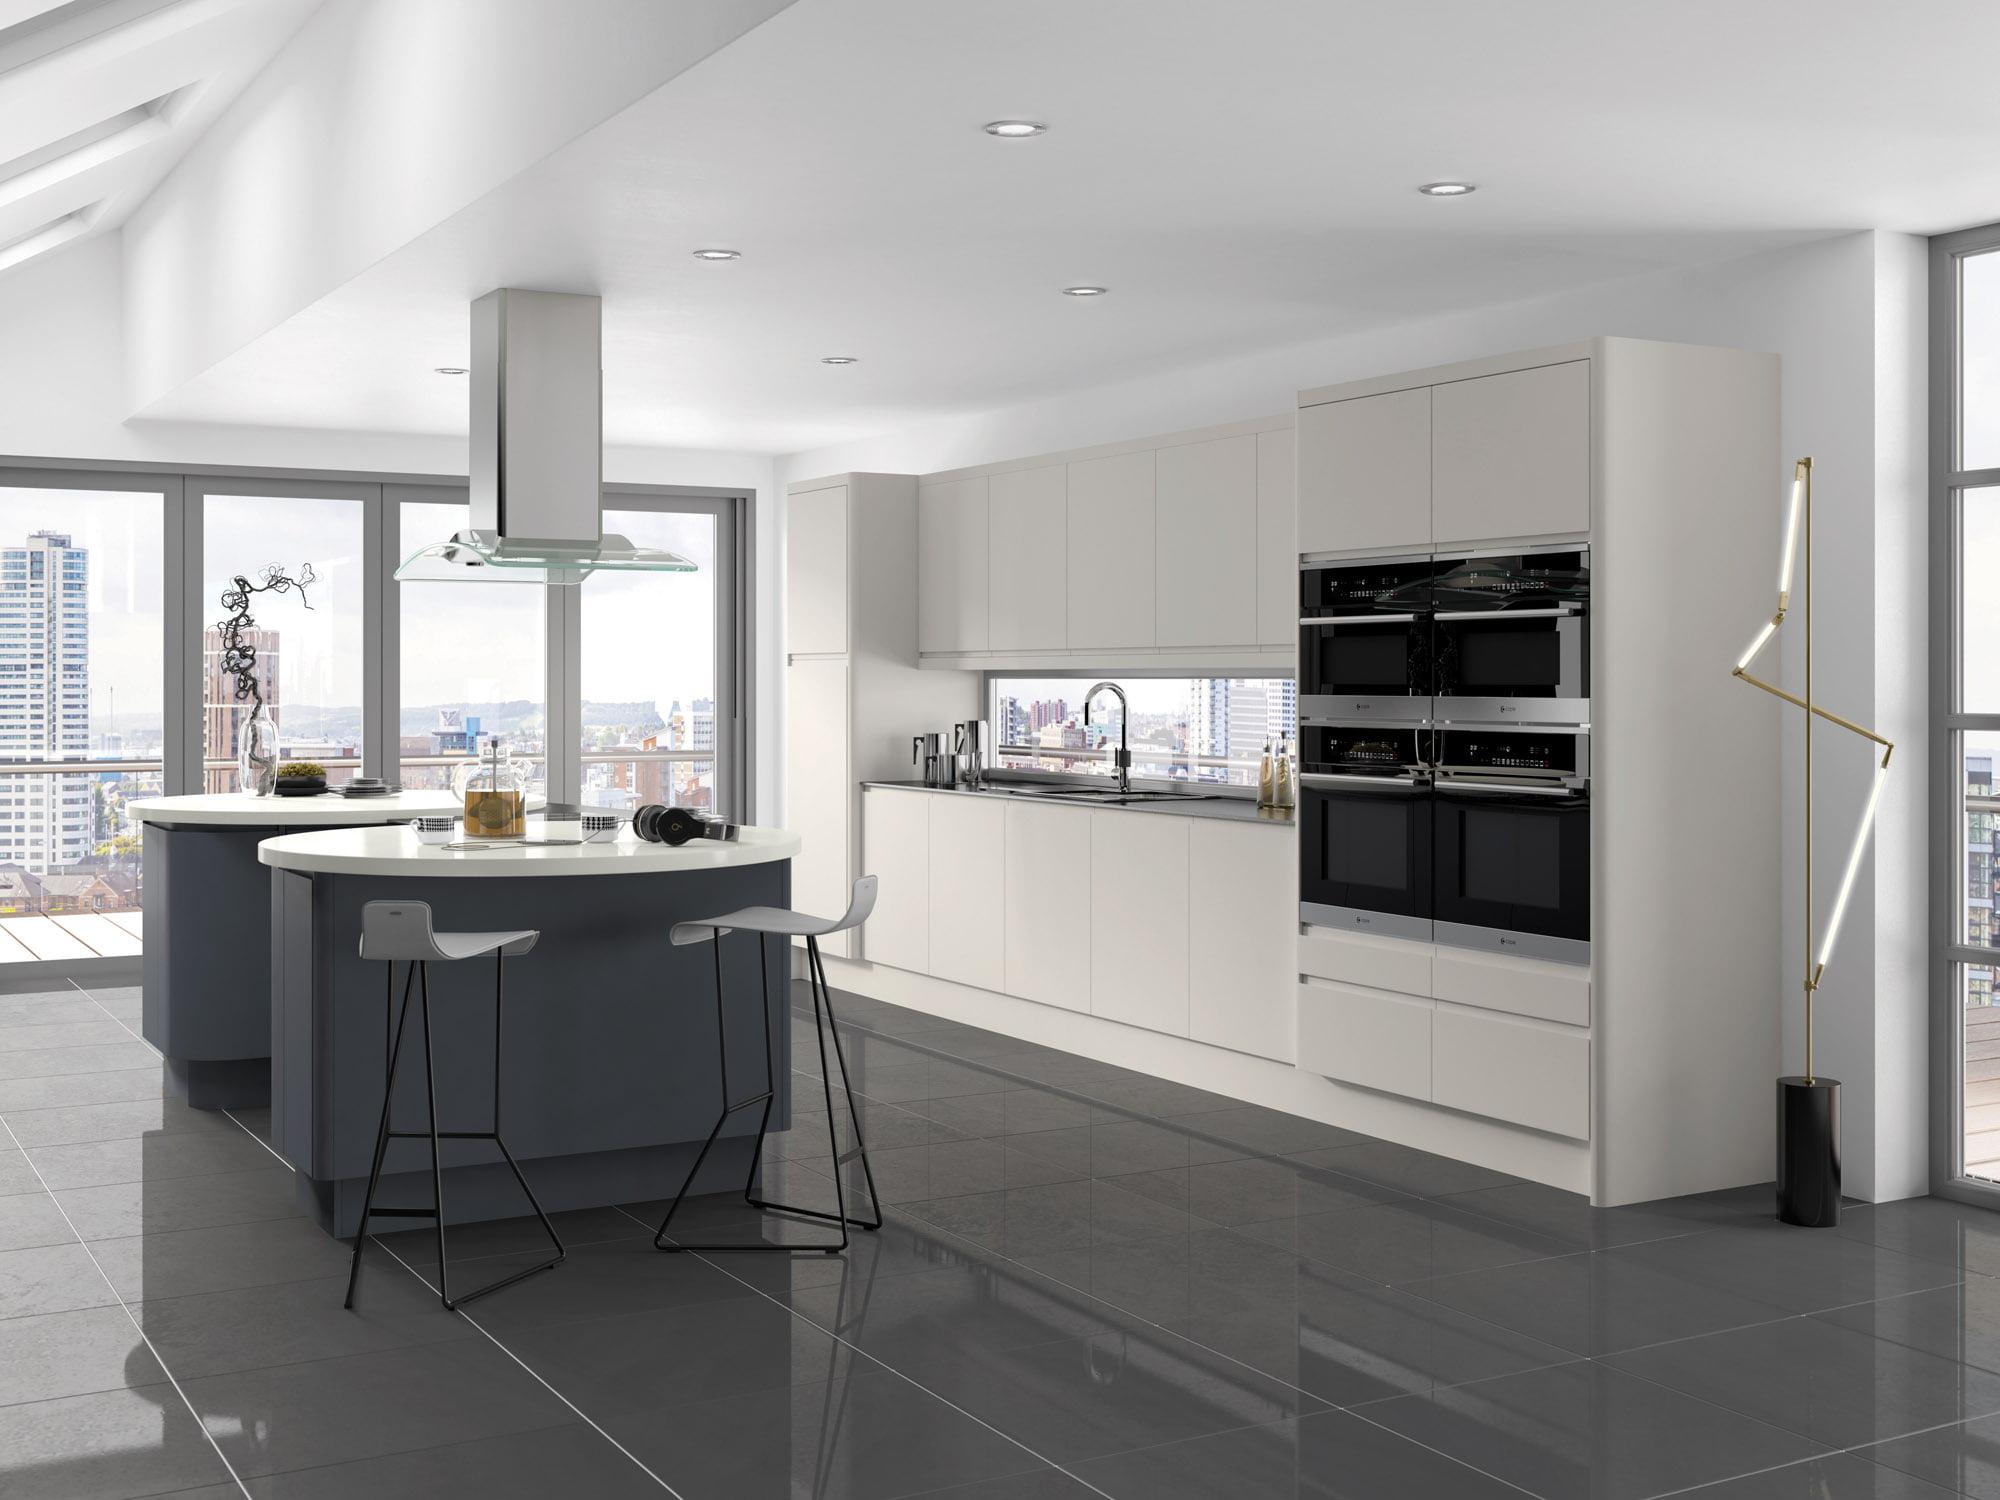 integra bleached stone with anthracite designer kitchen